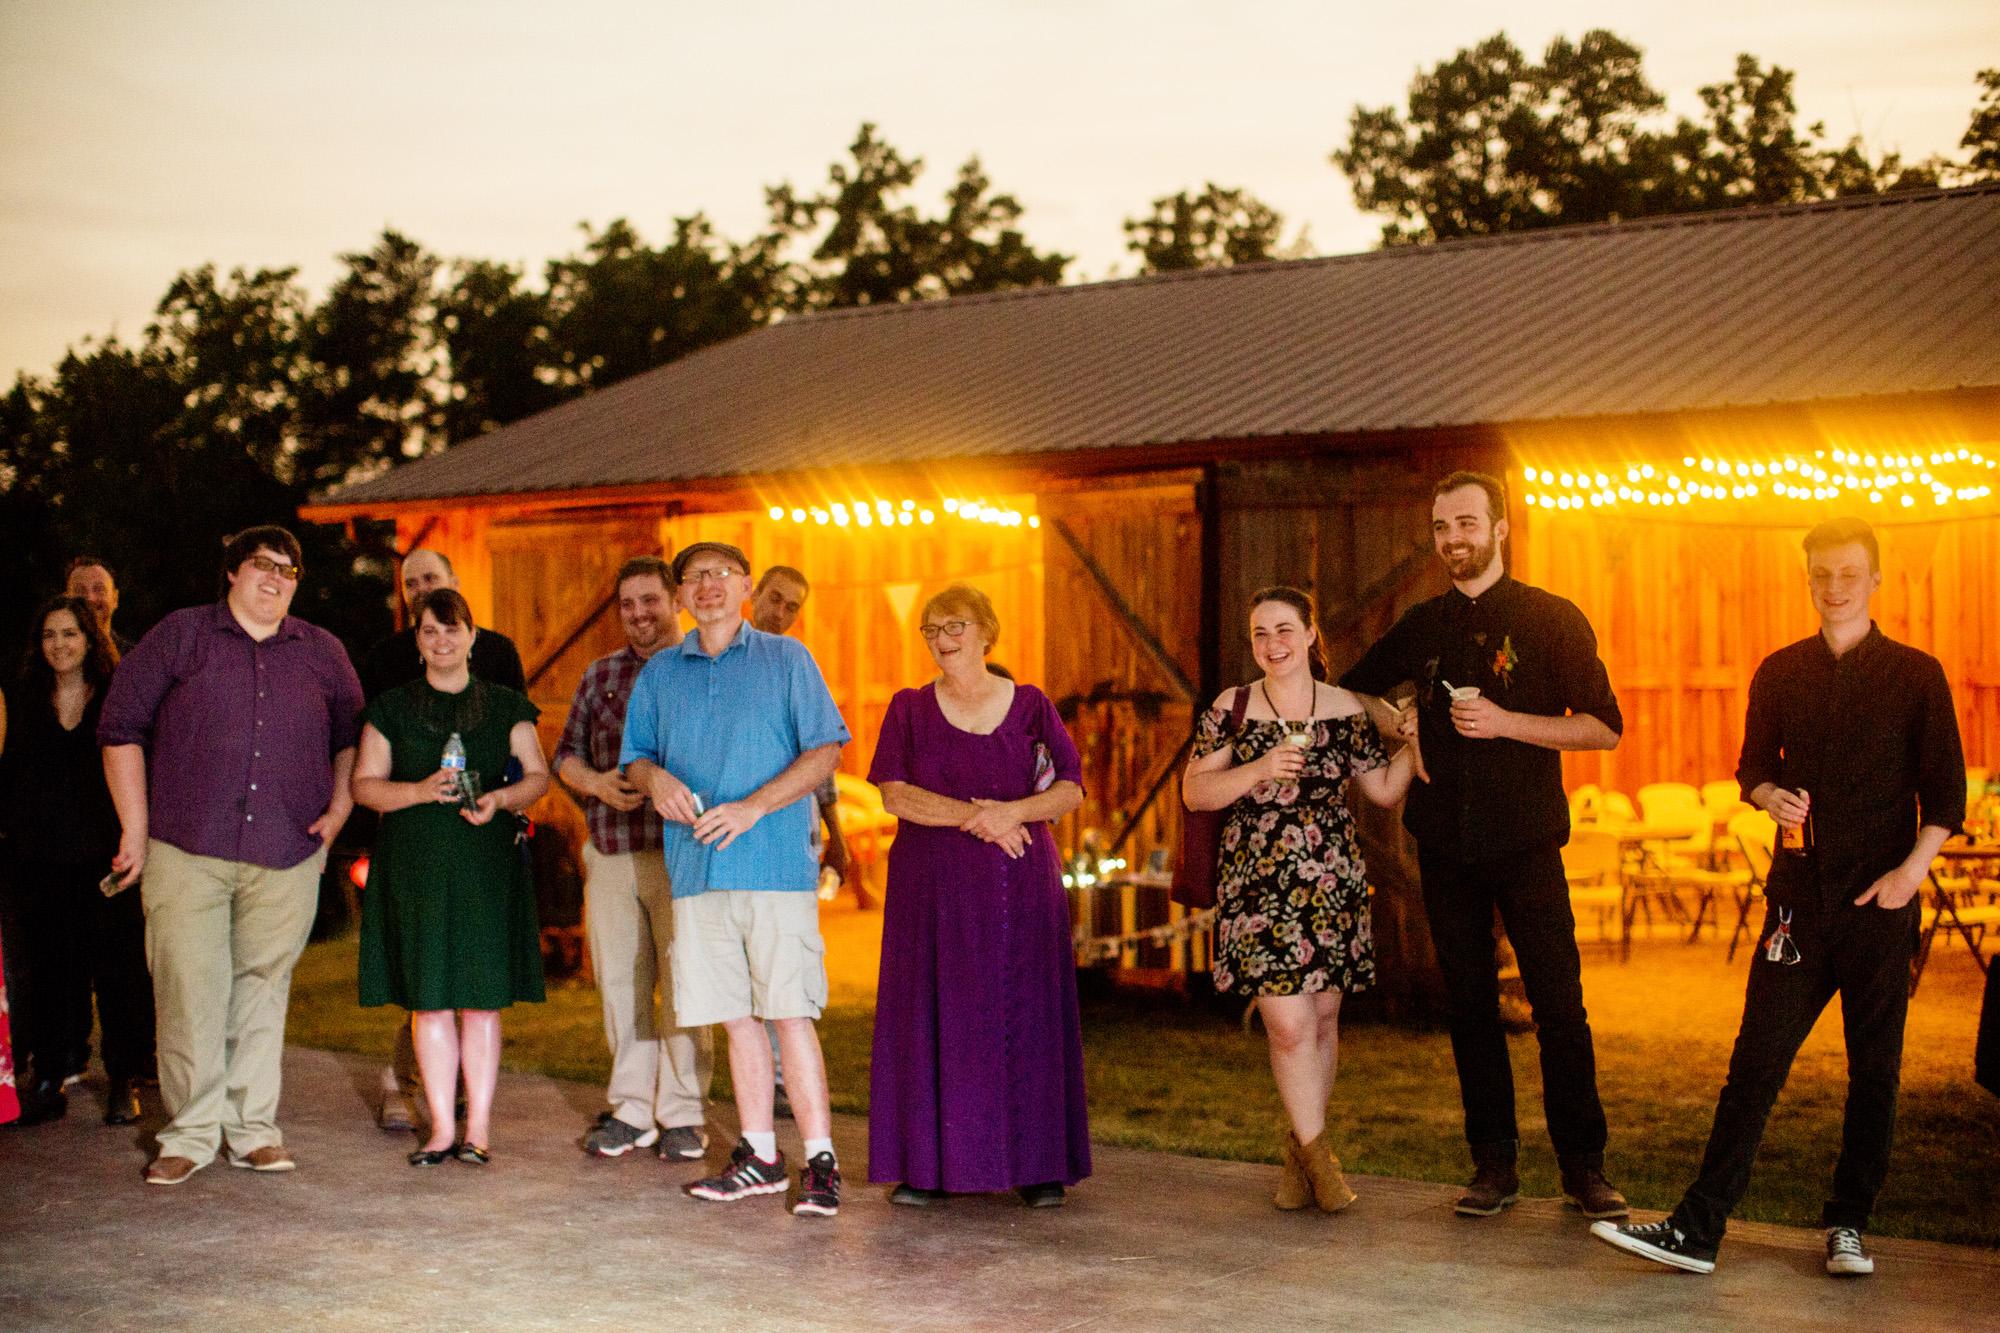 Seriously_Sabrina_Photography_Red_River_Gorge_Kentucky_Wedding_ShawnDana206.jpg